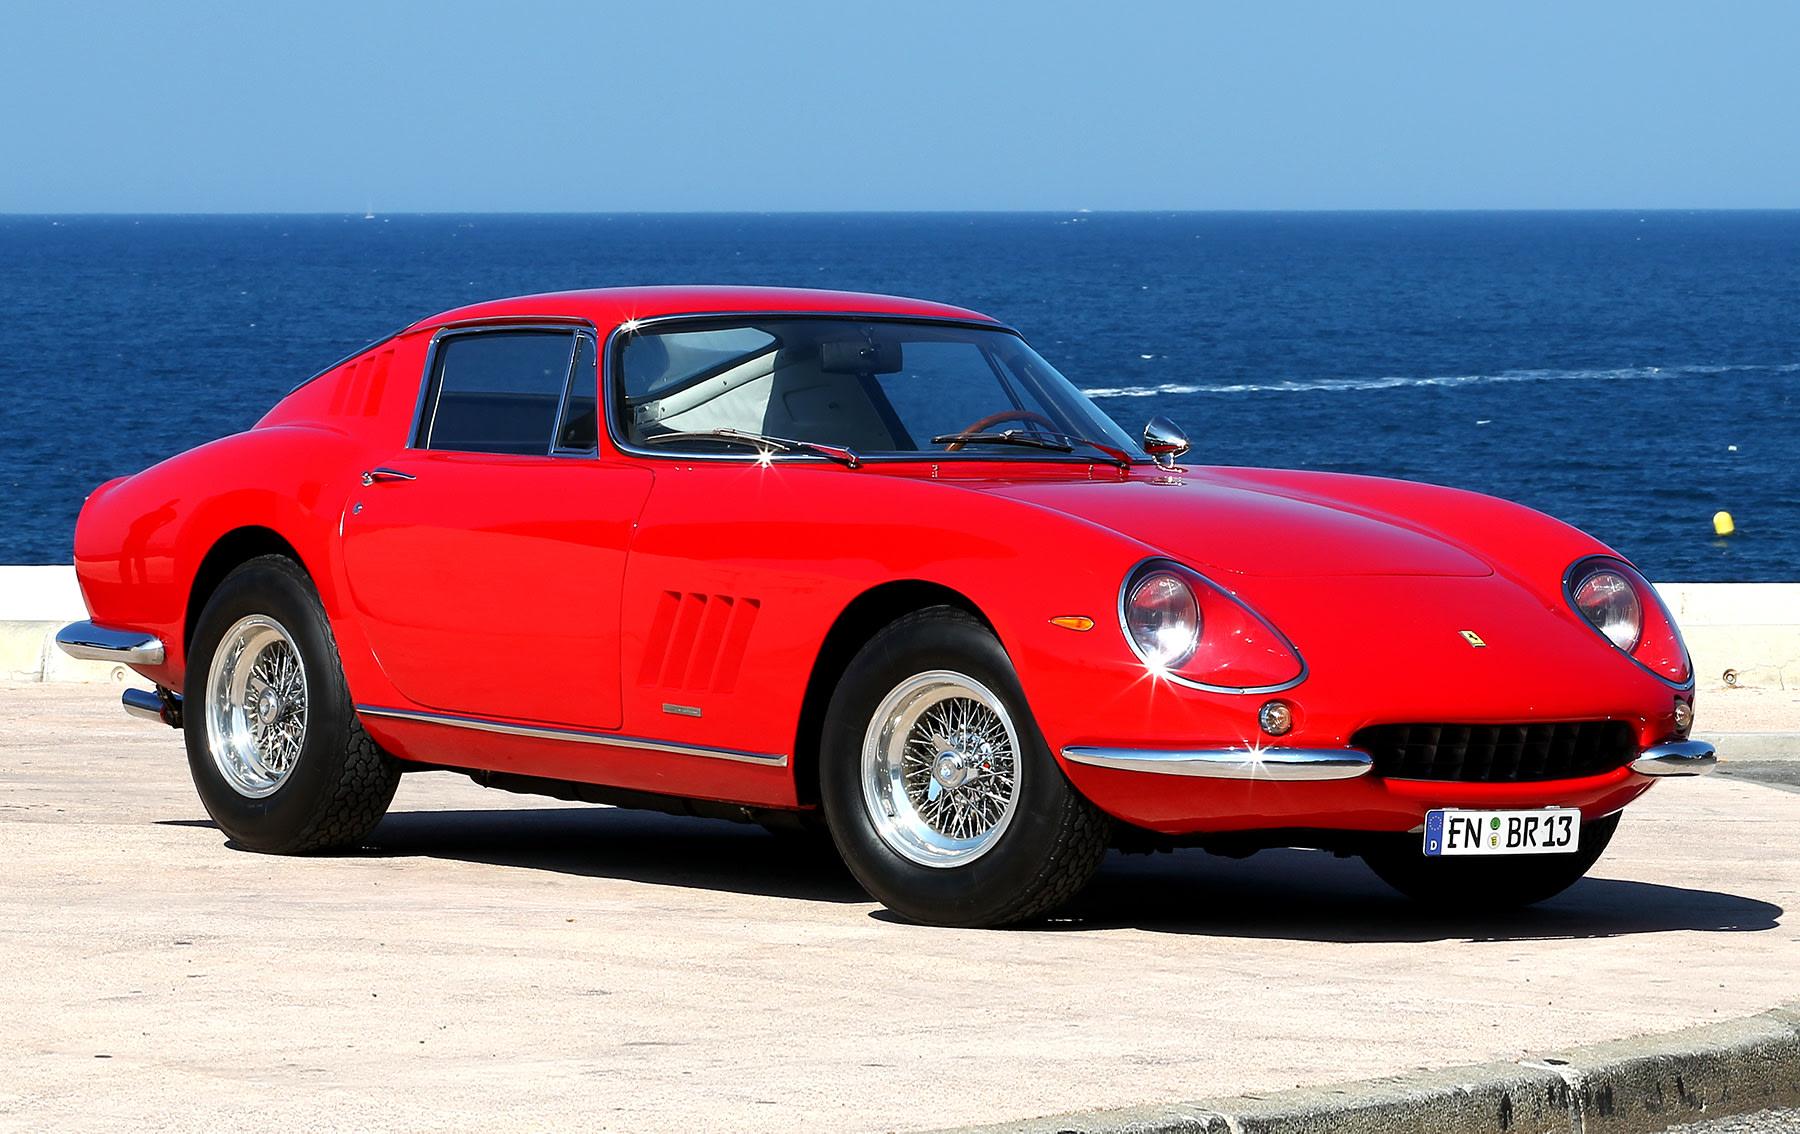 1966 Ferrari 275 GTB Alloy Long-Nose